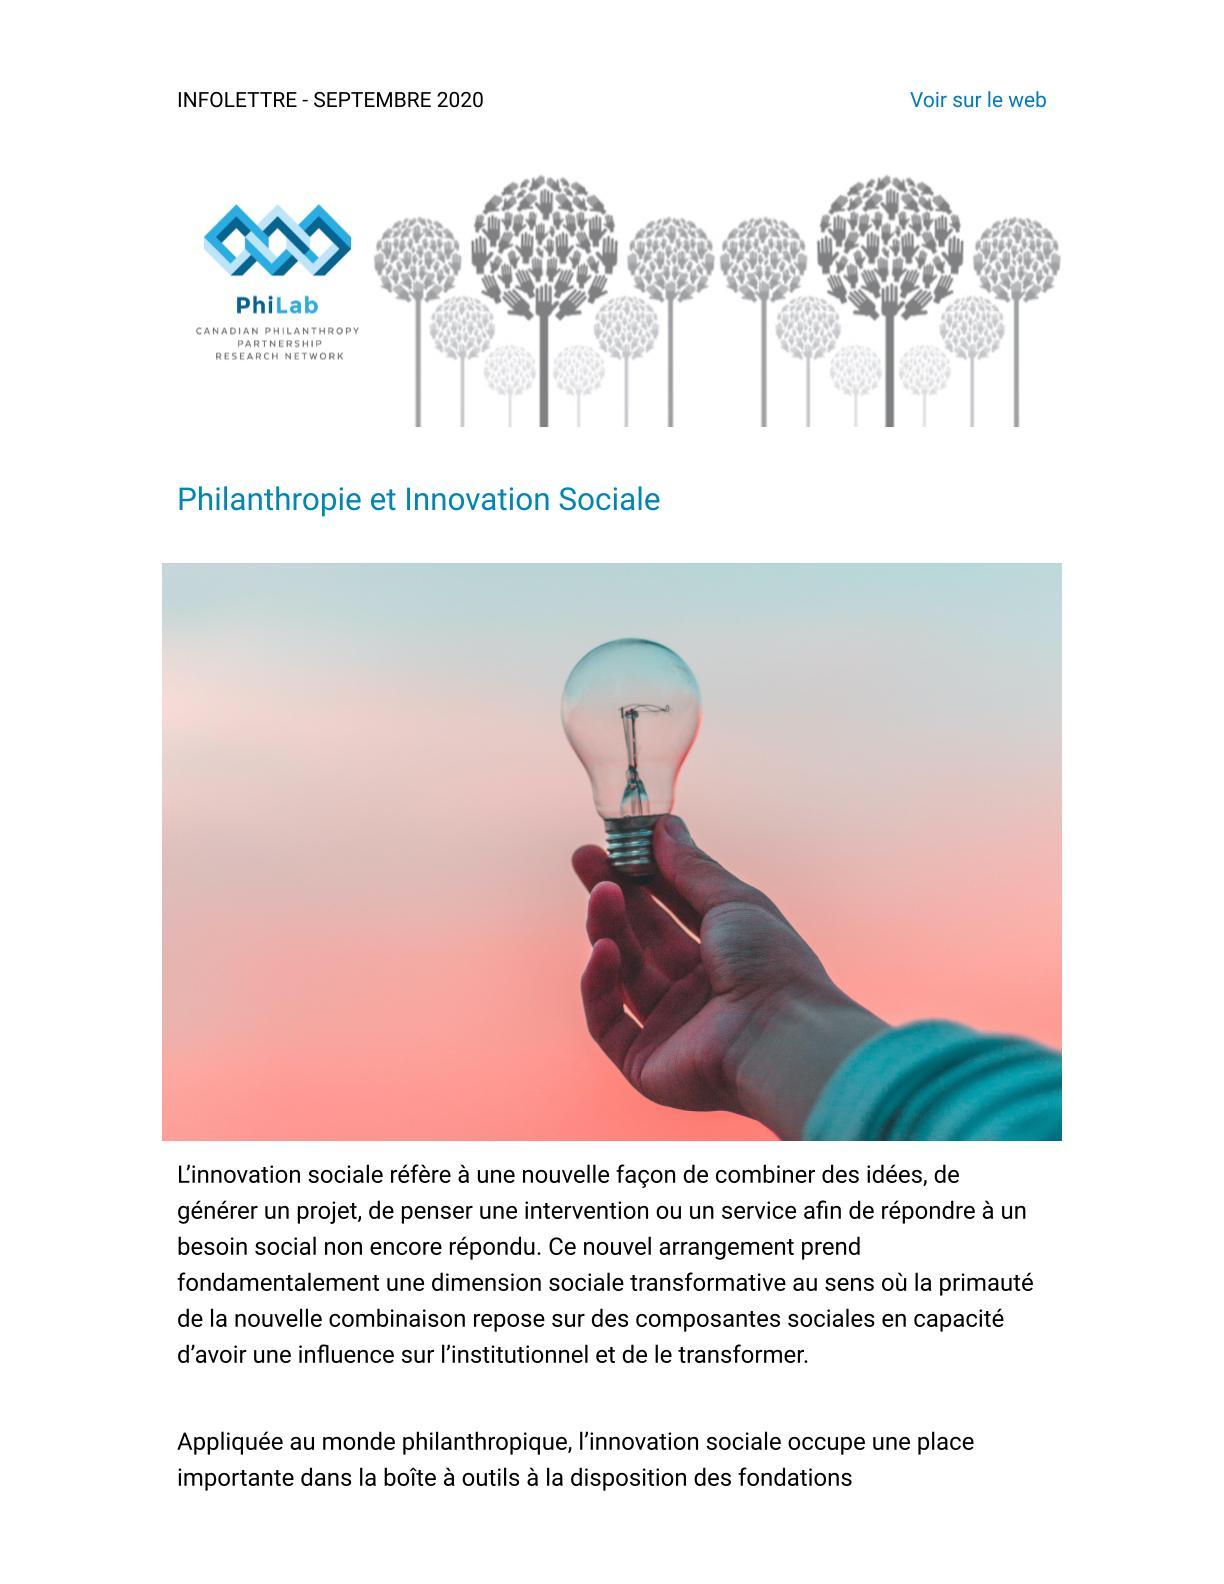 Philanthropie et Innovation Sociale